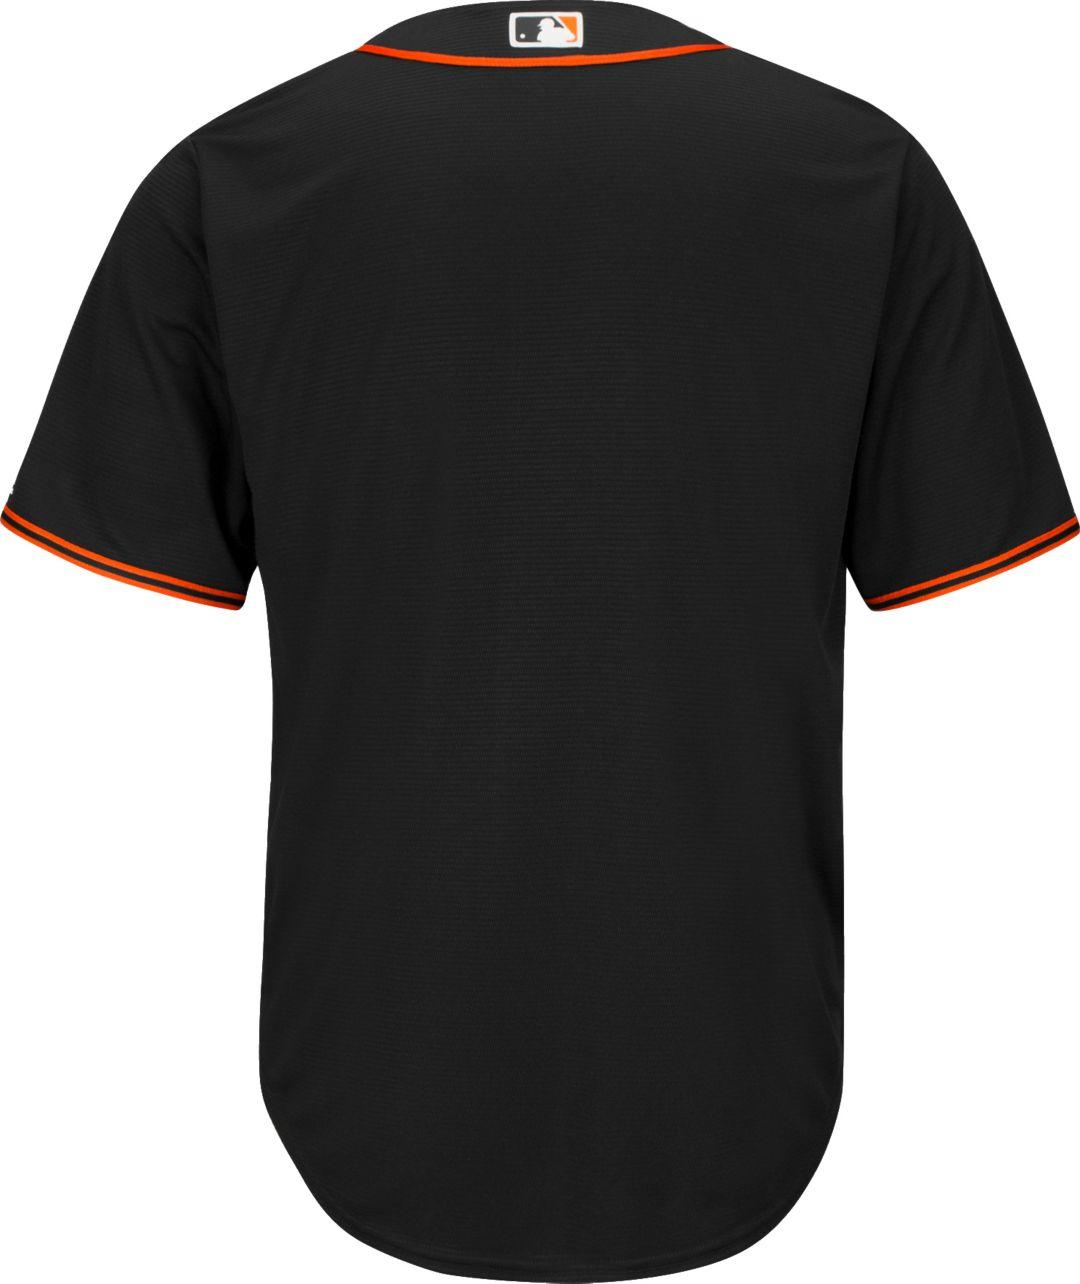 buy online 716e0 c0283 Majestic Men's Replica San Francisco Giants Cool Base Alternate Black Jersey